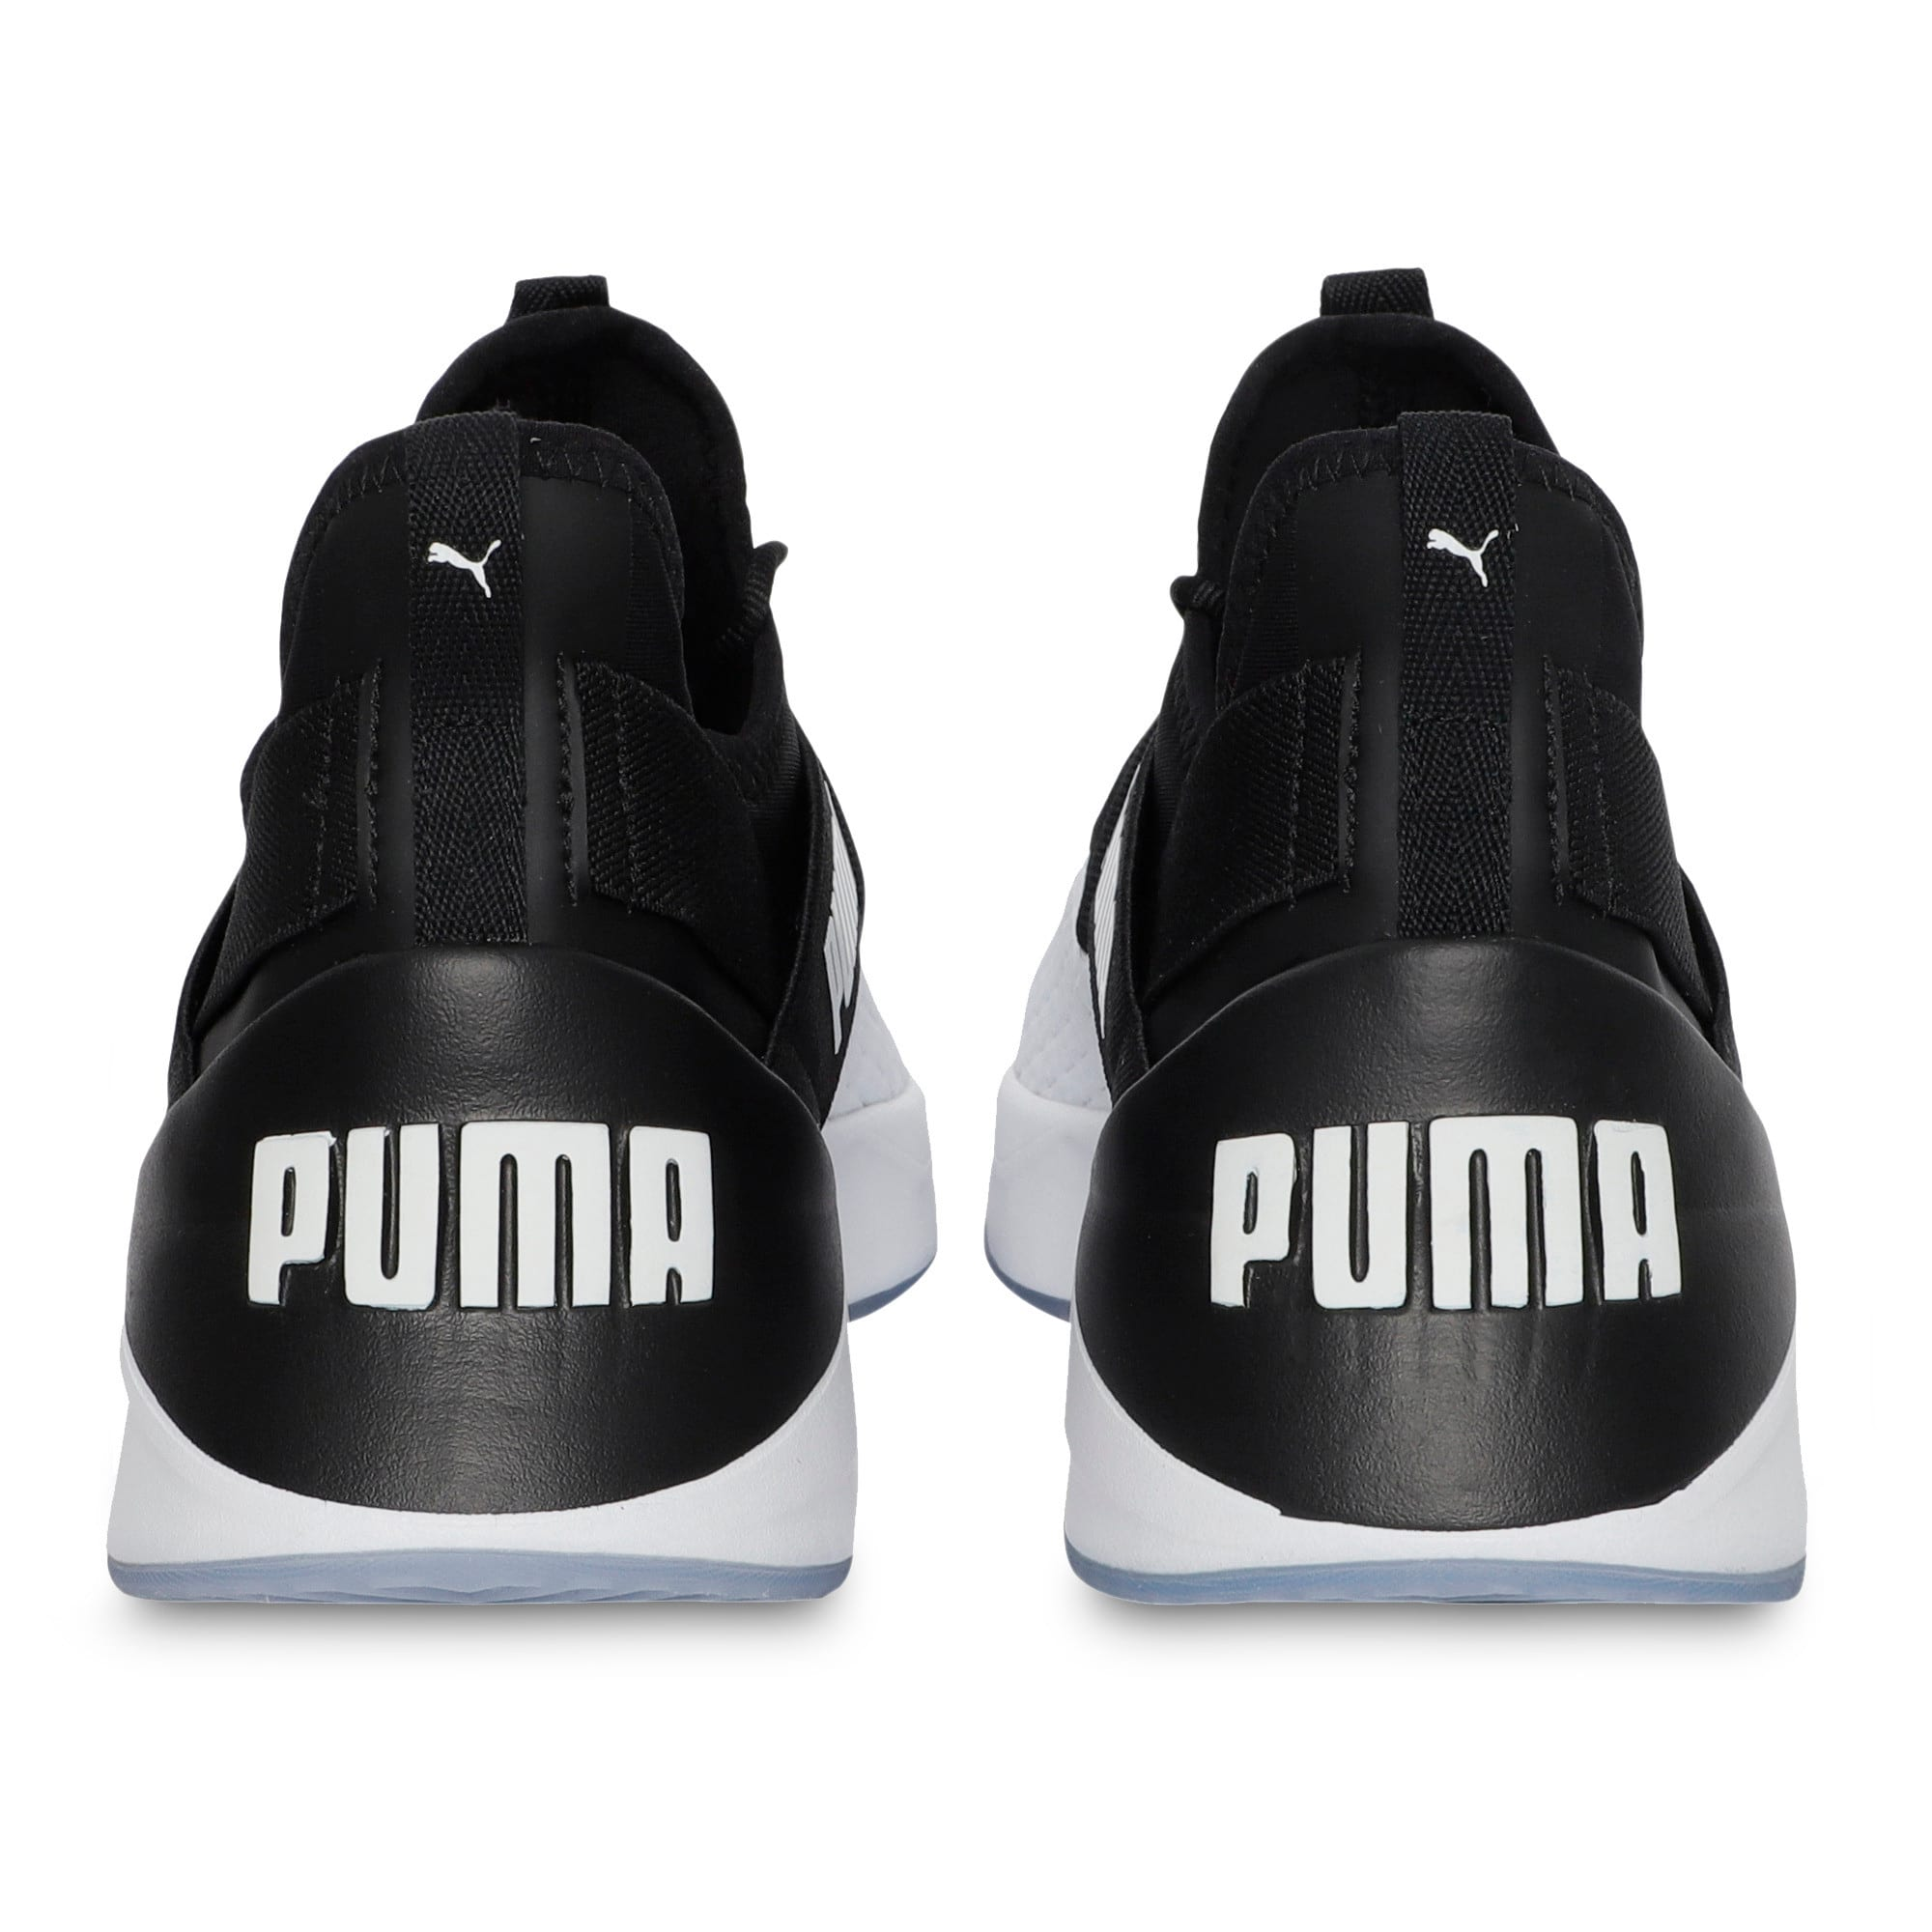 Thumbnail 3 of Jaab XT one8 Men's Training Shoes, Puma White-Puma Black, medium-IND